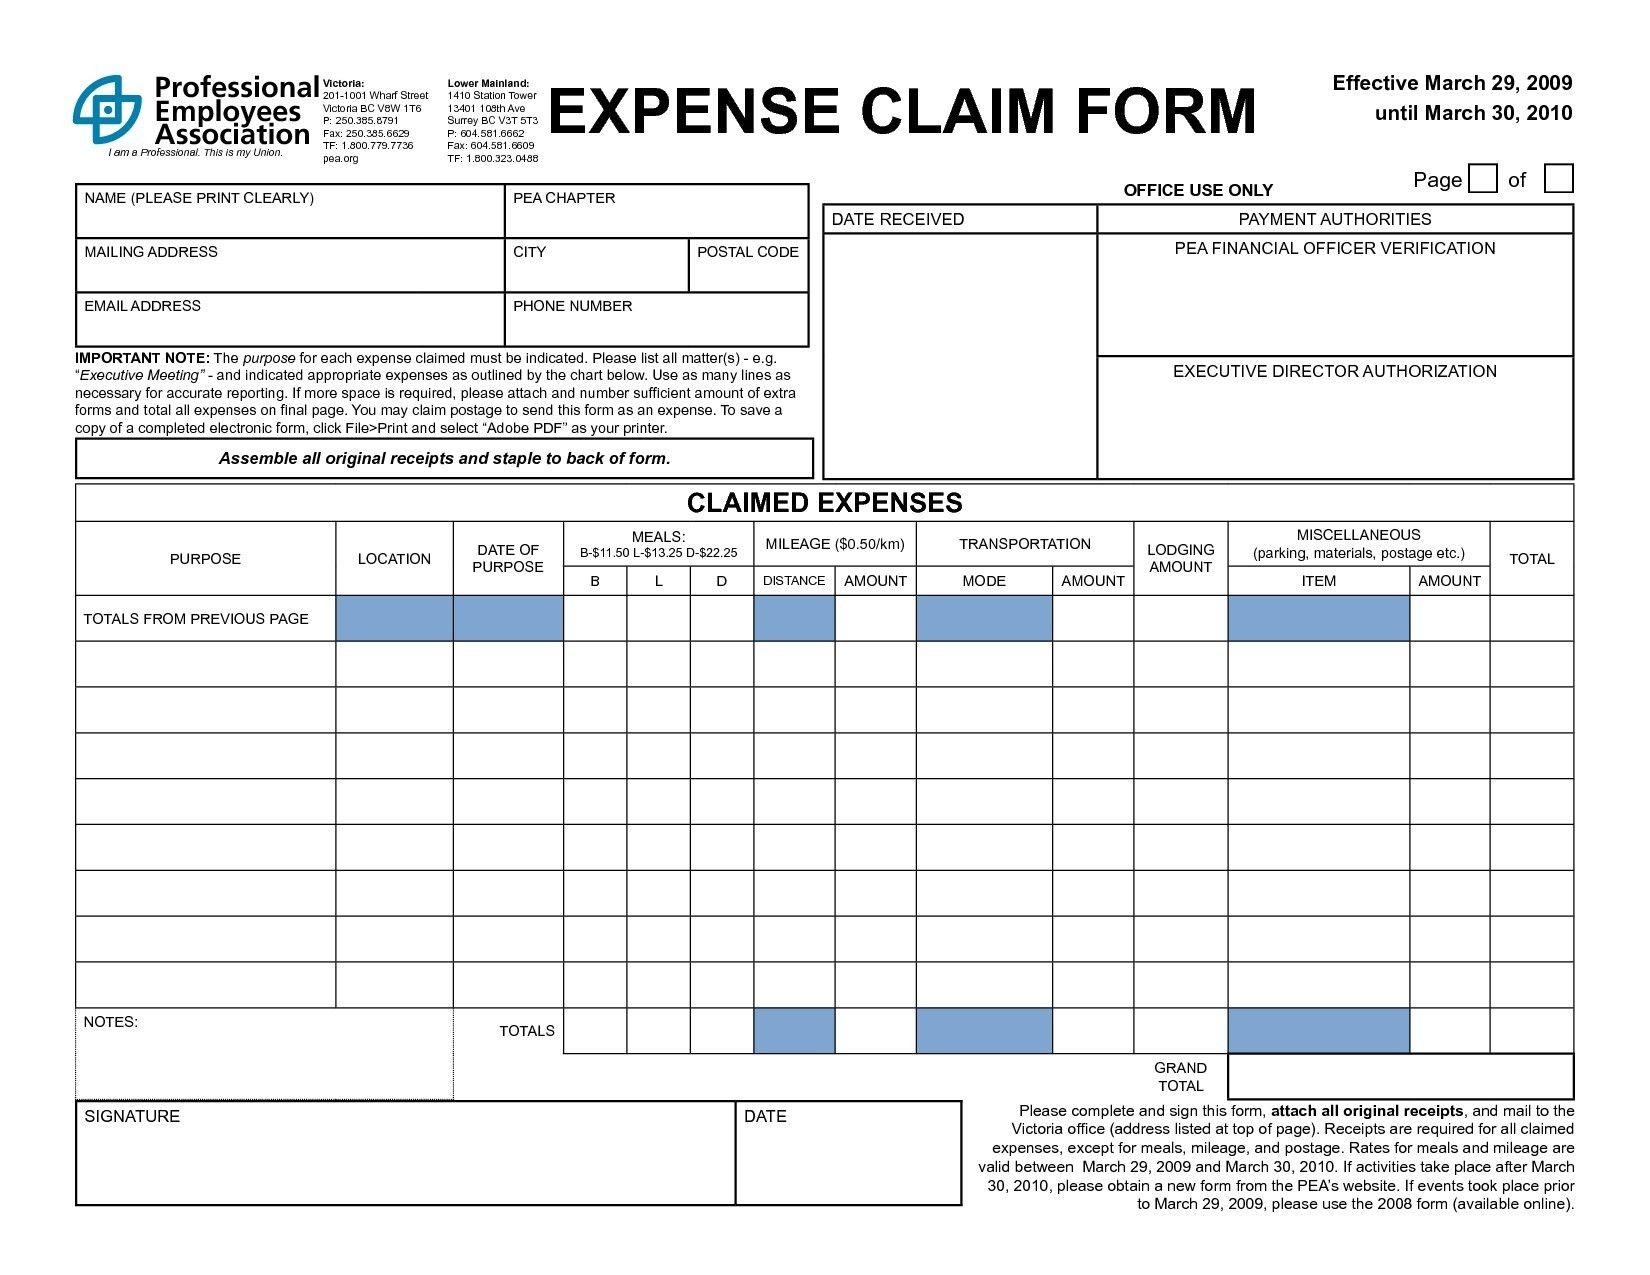 New Travel Expense Form Template Exceltemplate Xls Xlstemplate